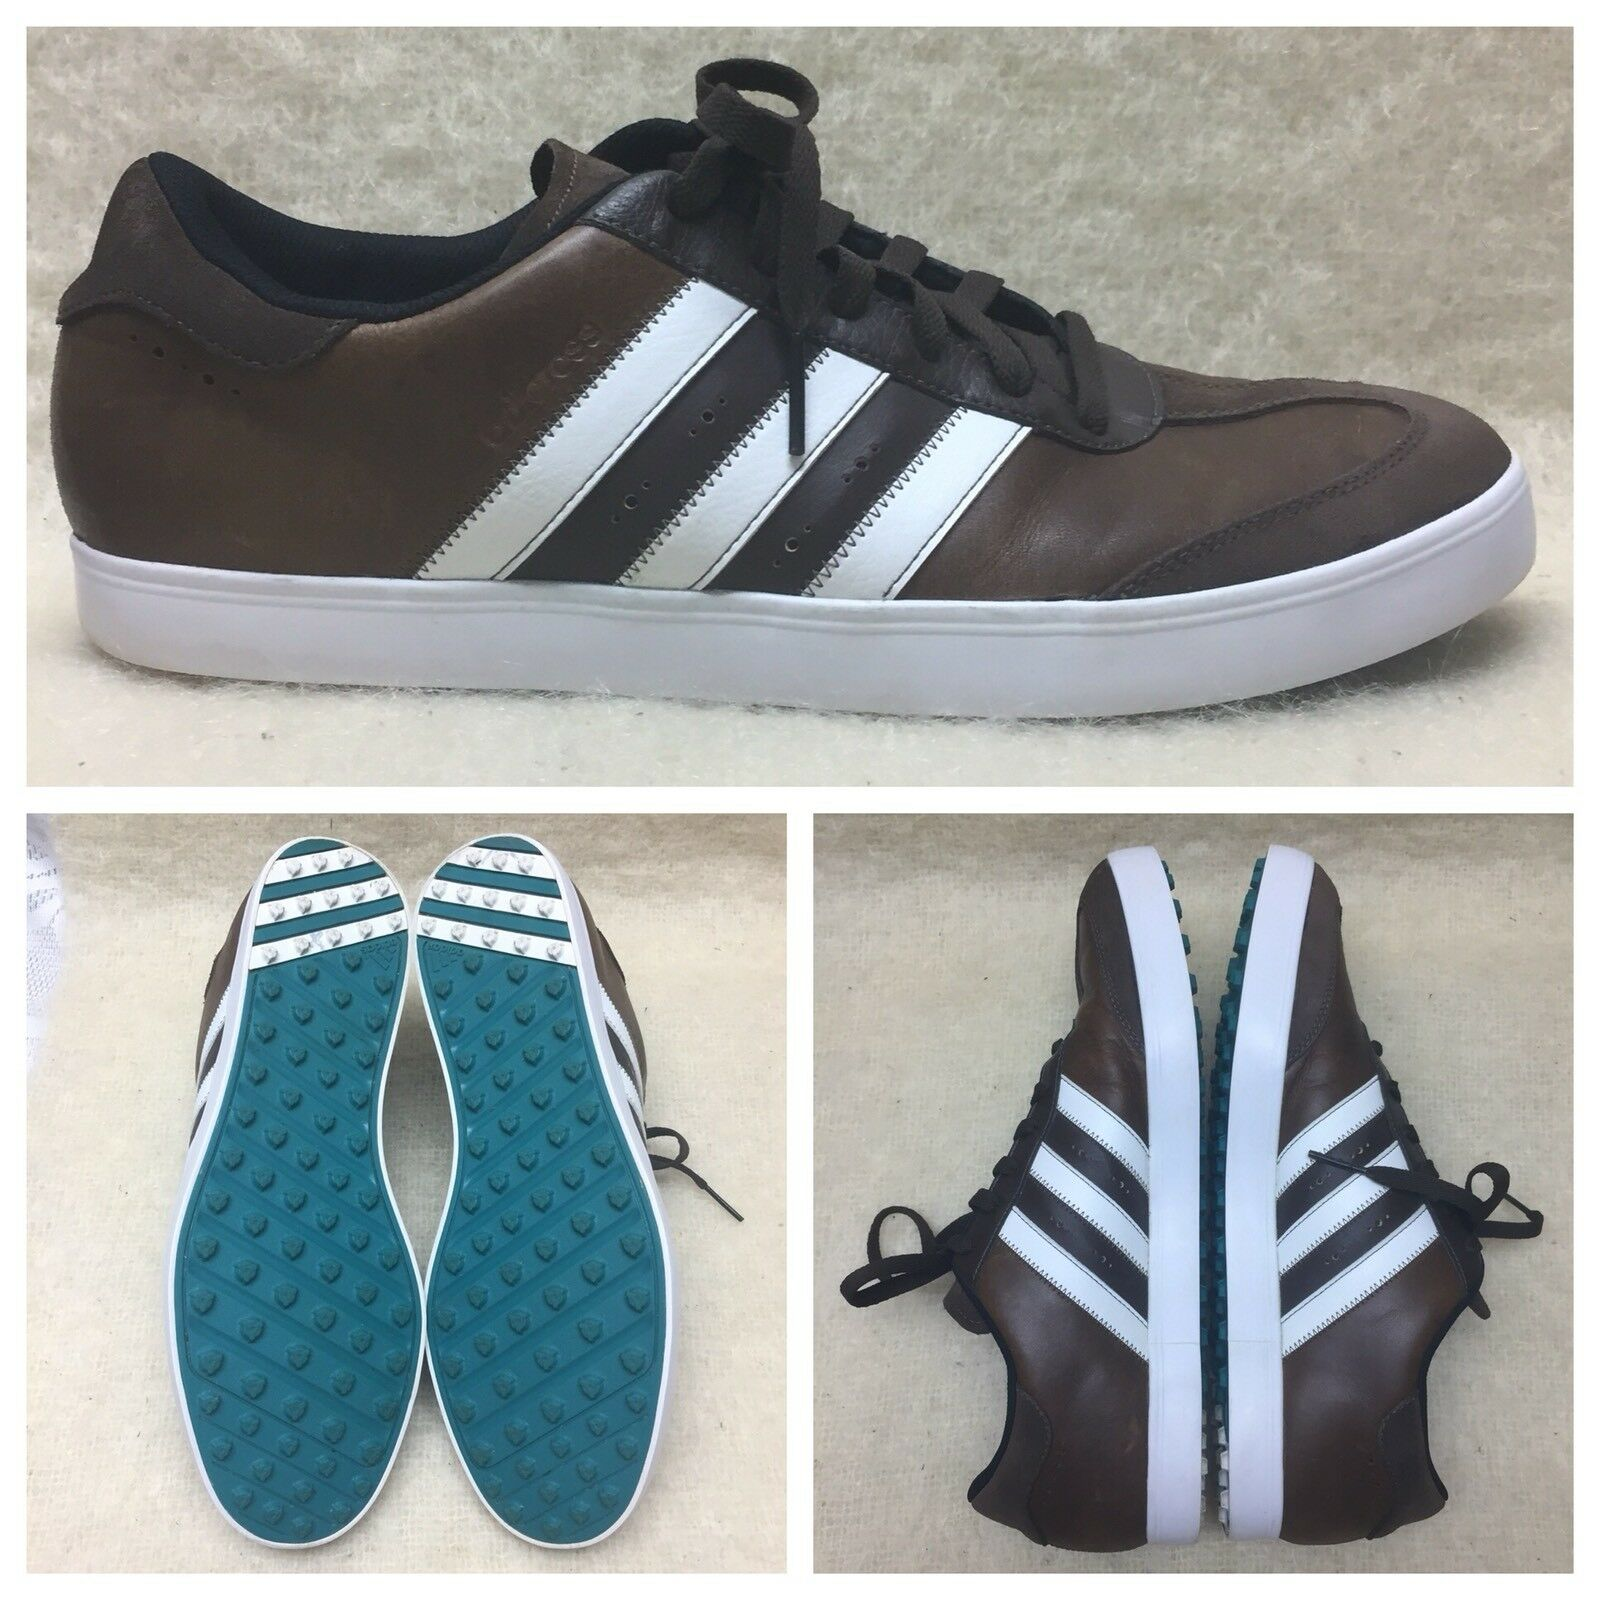 Adidas marrone scamosciato & leather leather leather strisce multi sport scarpe evn 791001 Uomo numero 13 ba1e4d